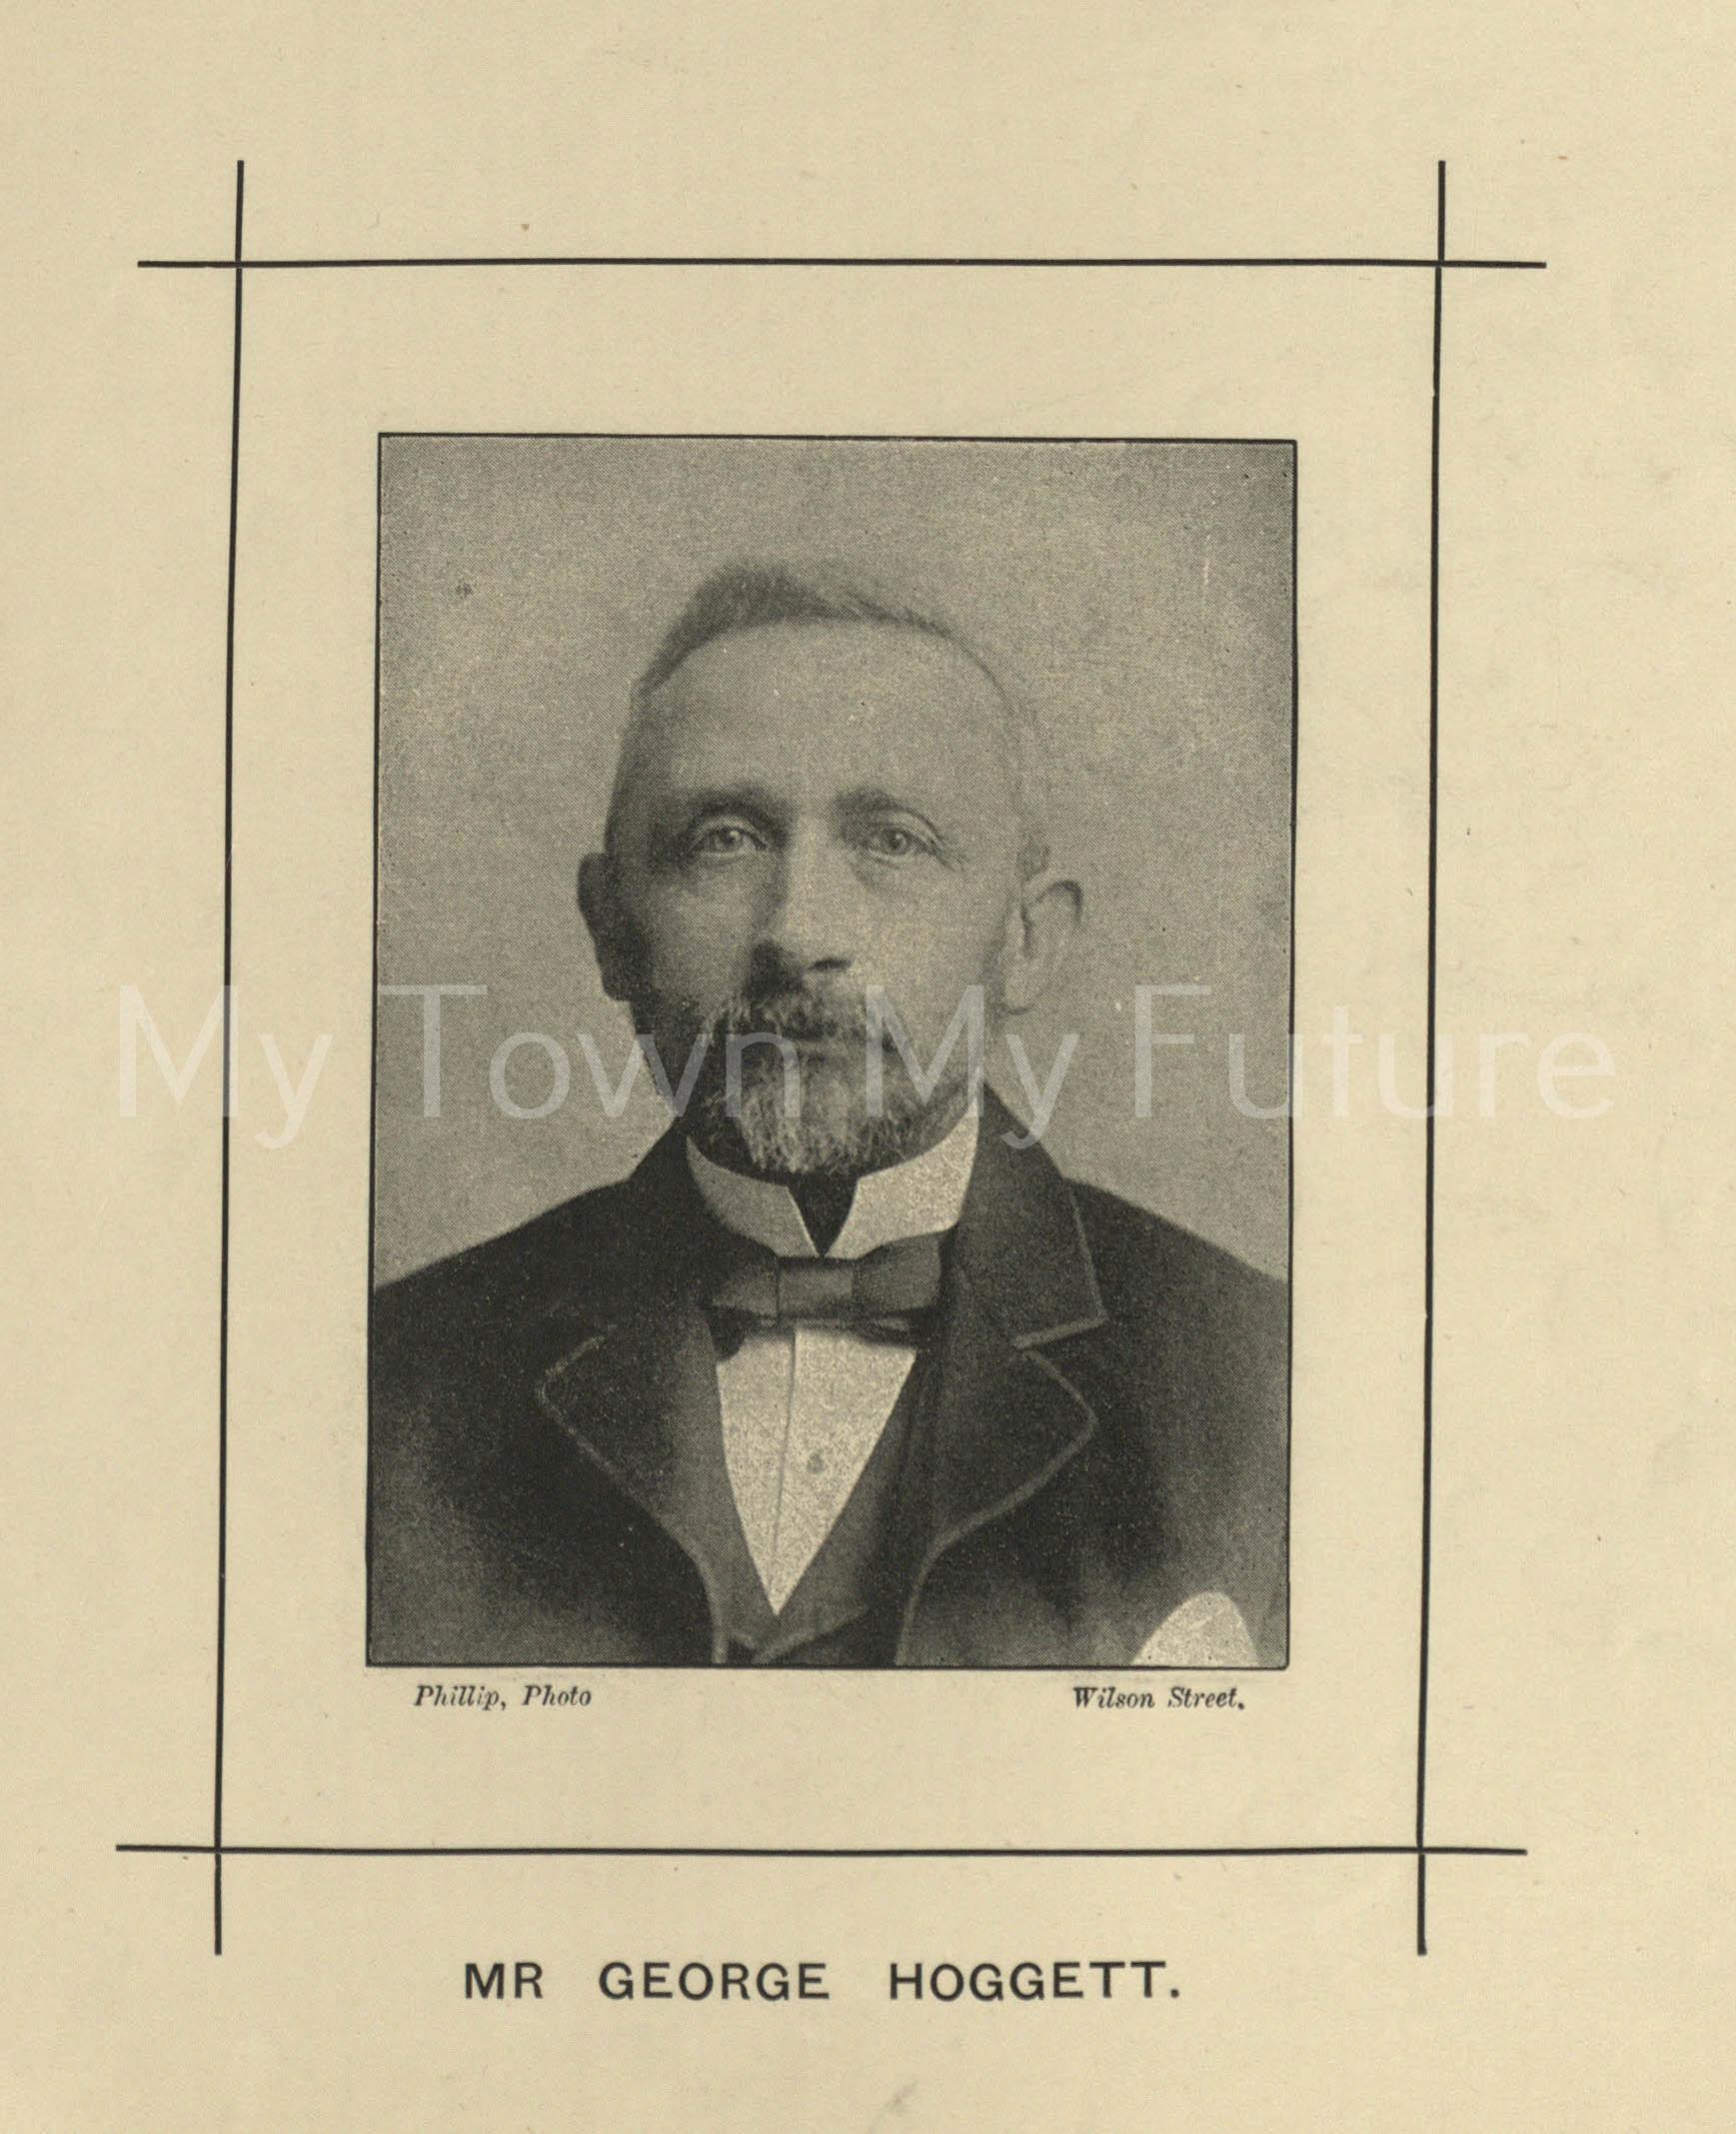 Mr George Hoggett